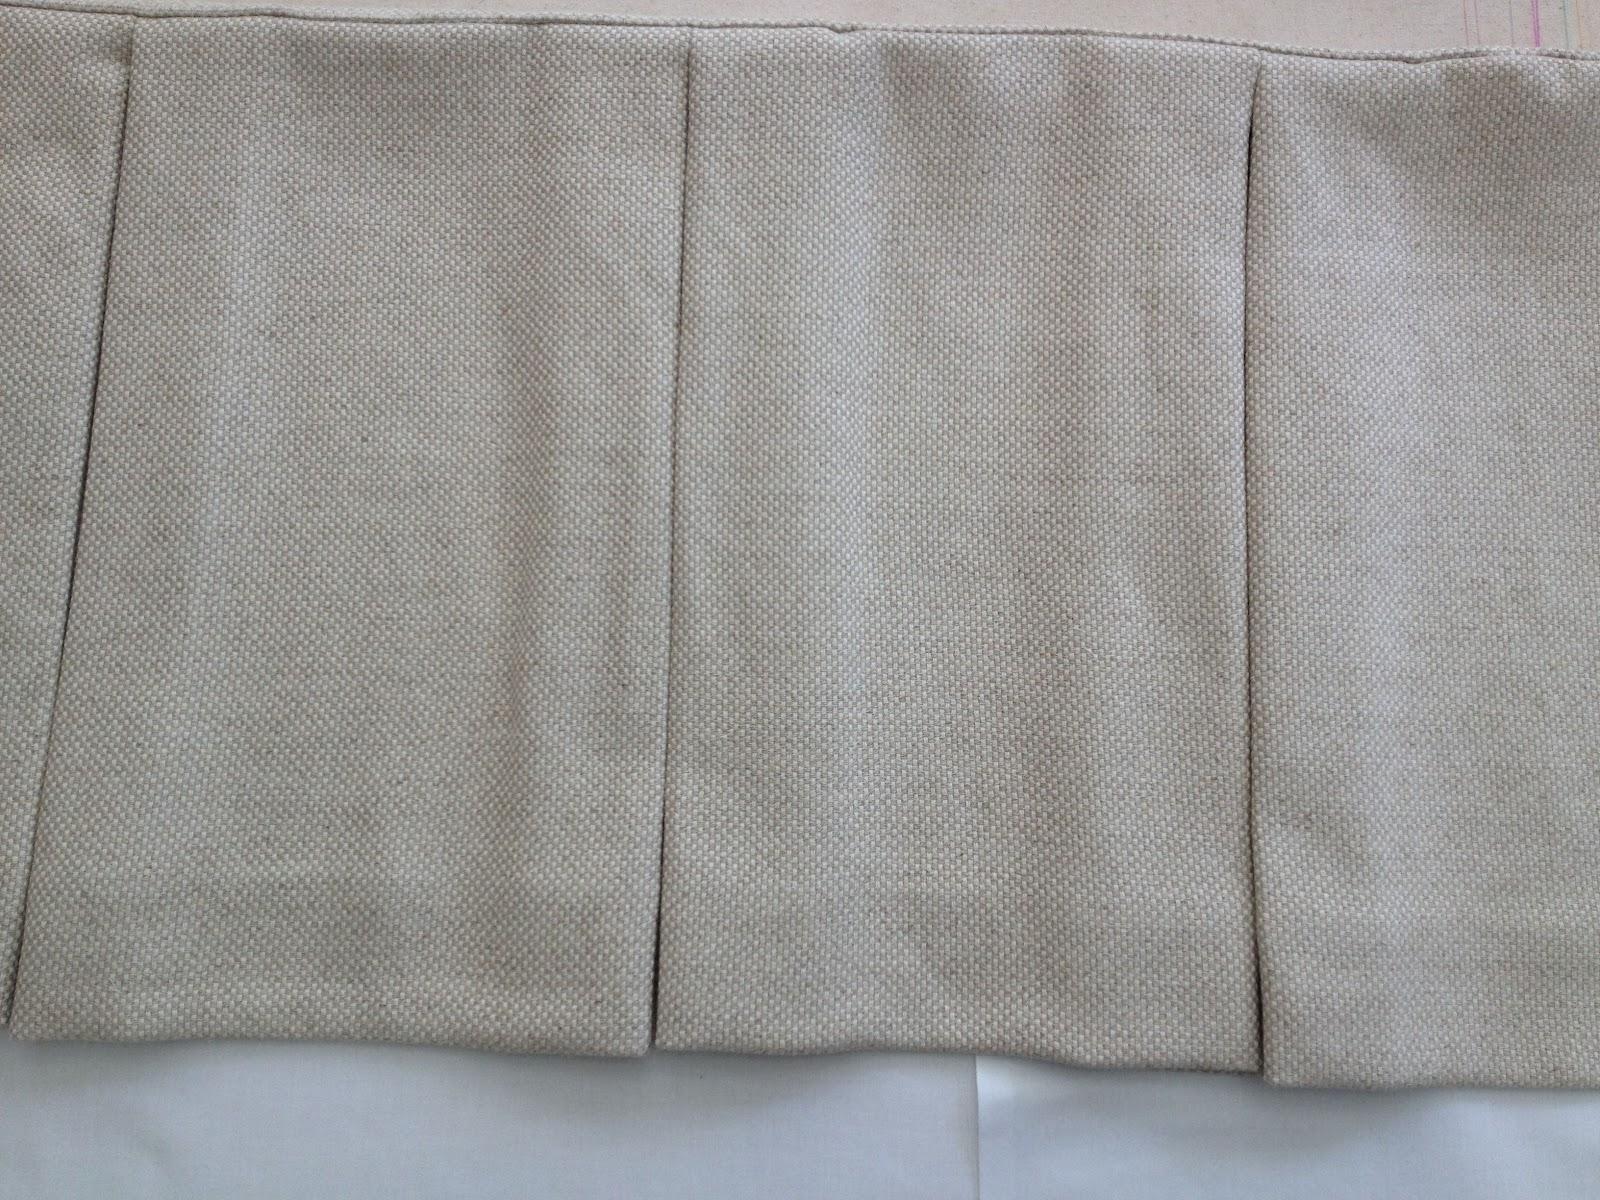 sew box pleat bed skirt